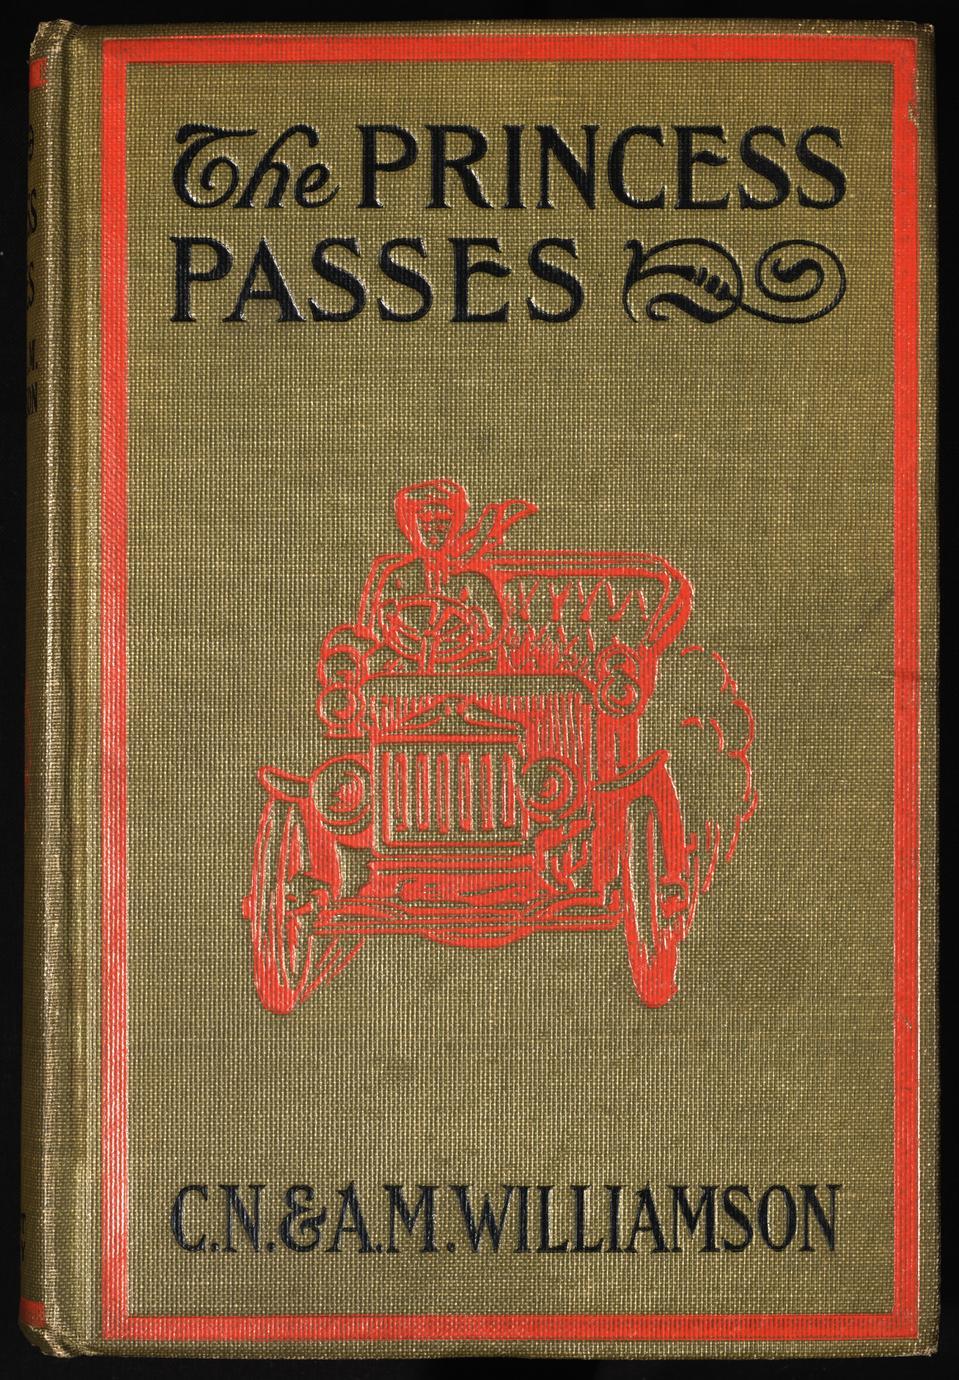 The princess passes : a romance of a motor car (1 of 2)